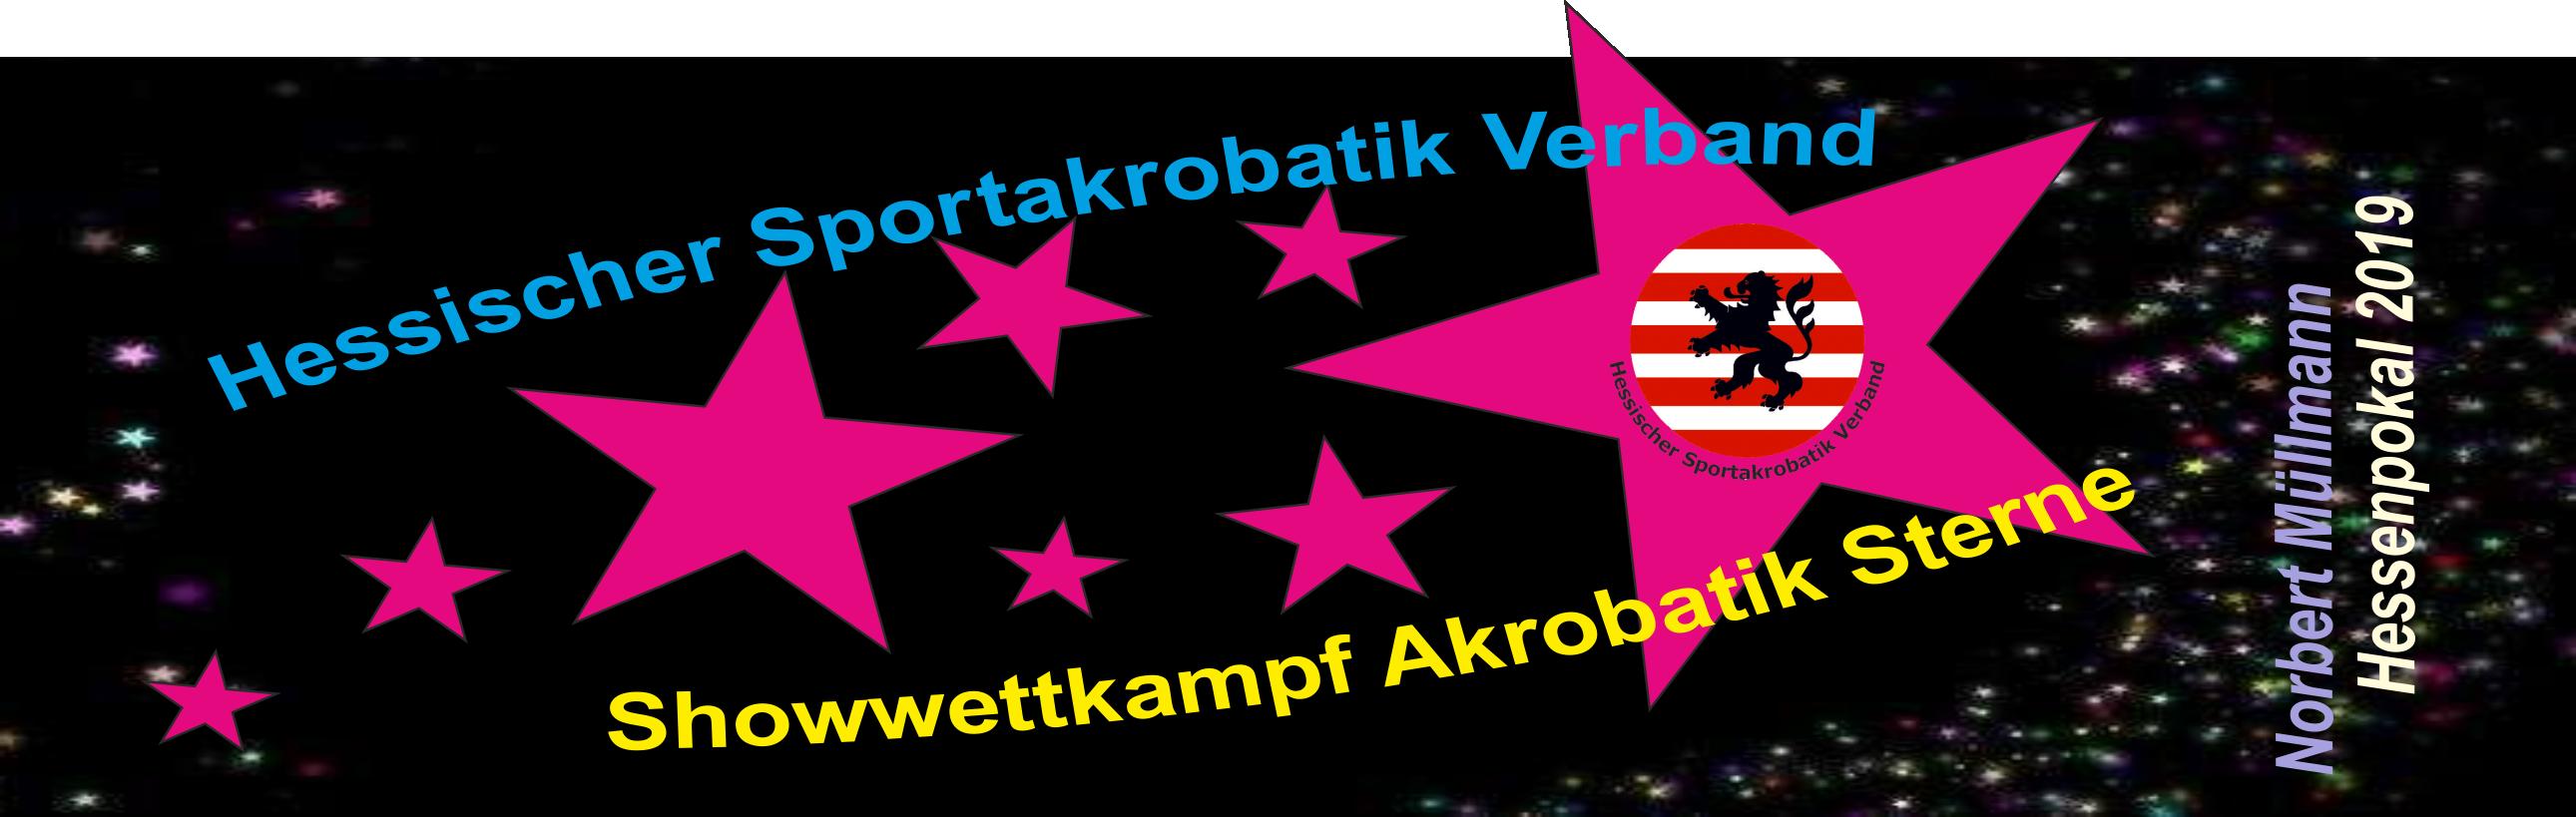 "Showwettkampf ""Akrobatik Sterne"""